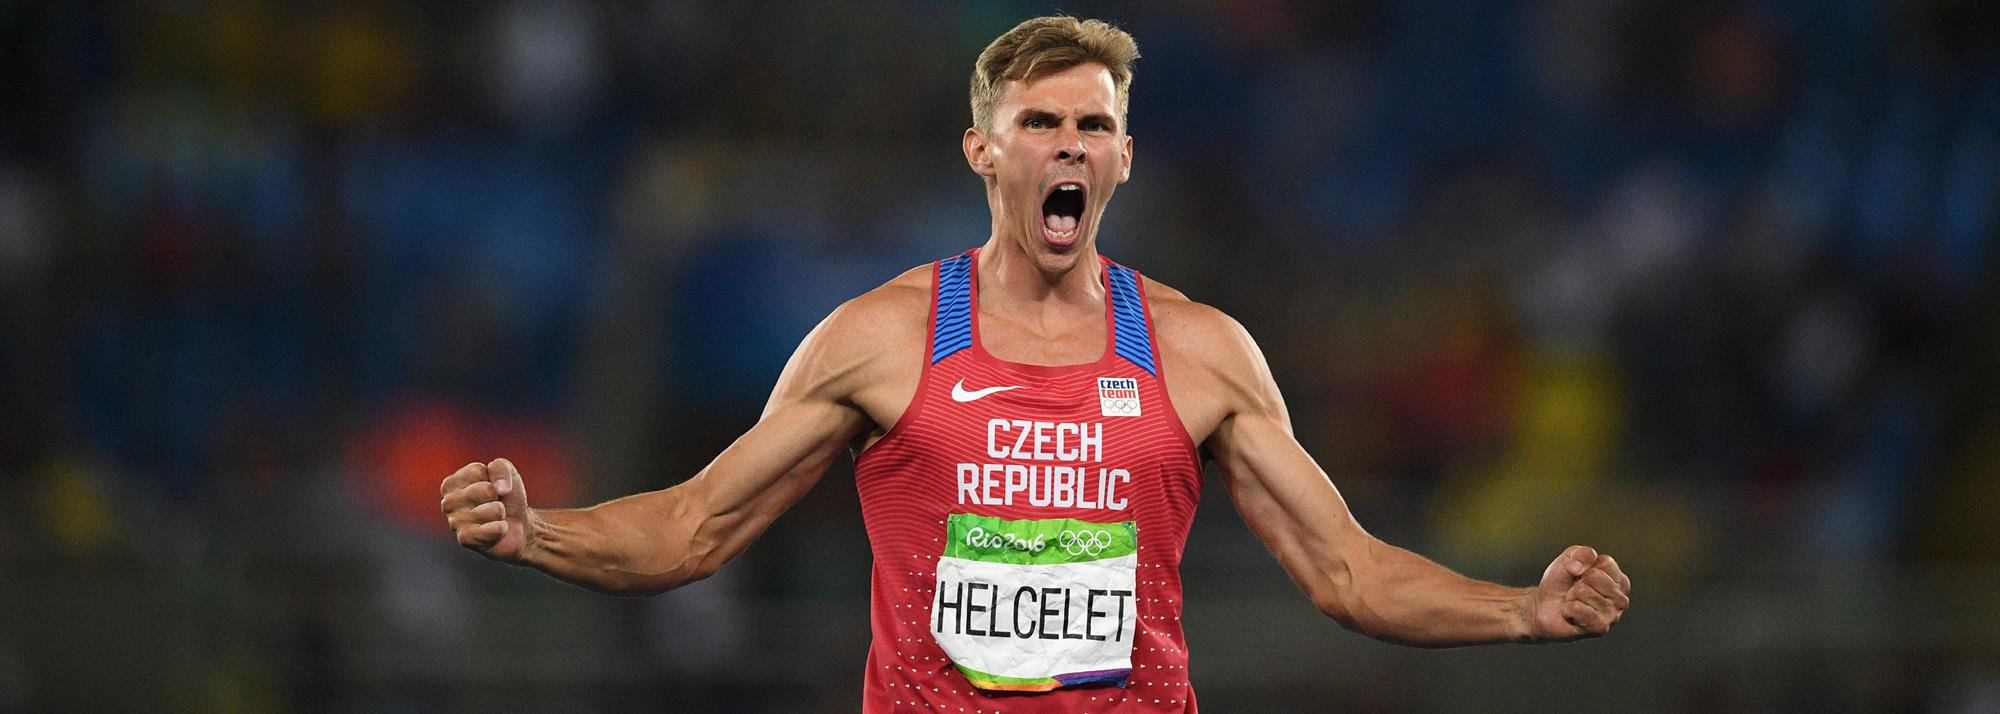 Helcelet: the decathlon's international man of history